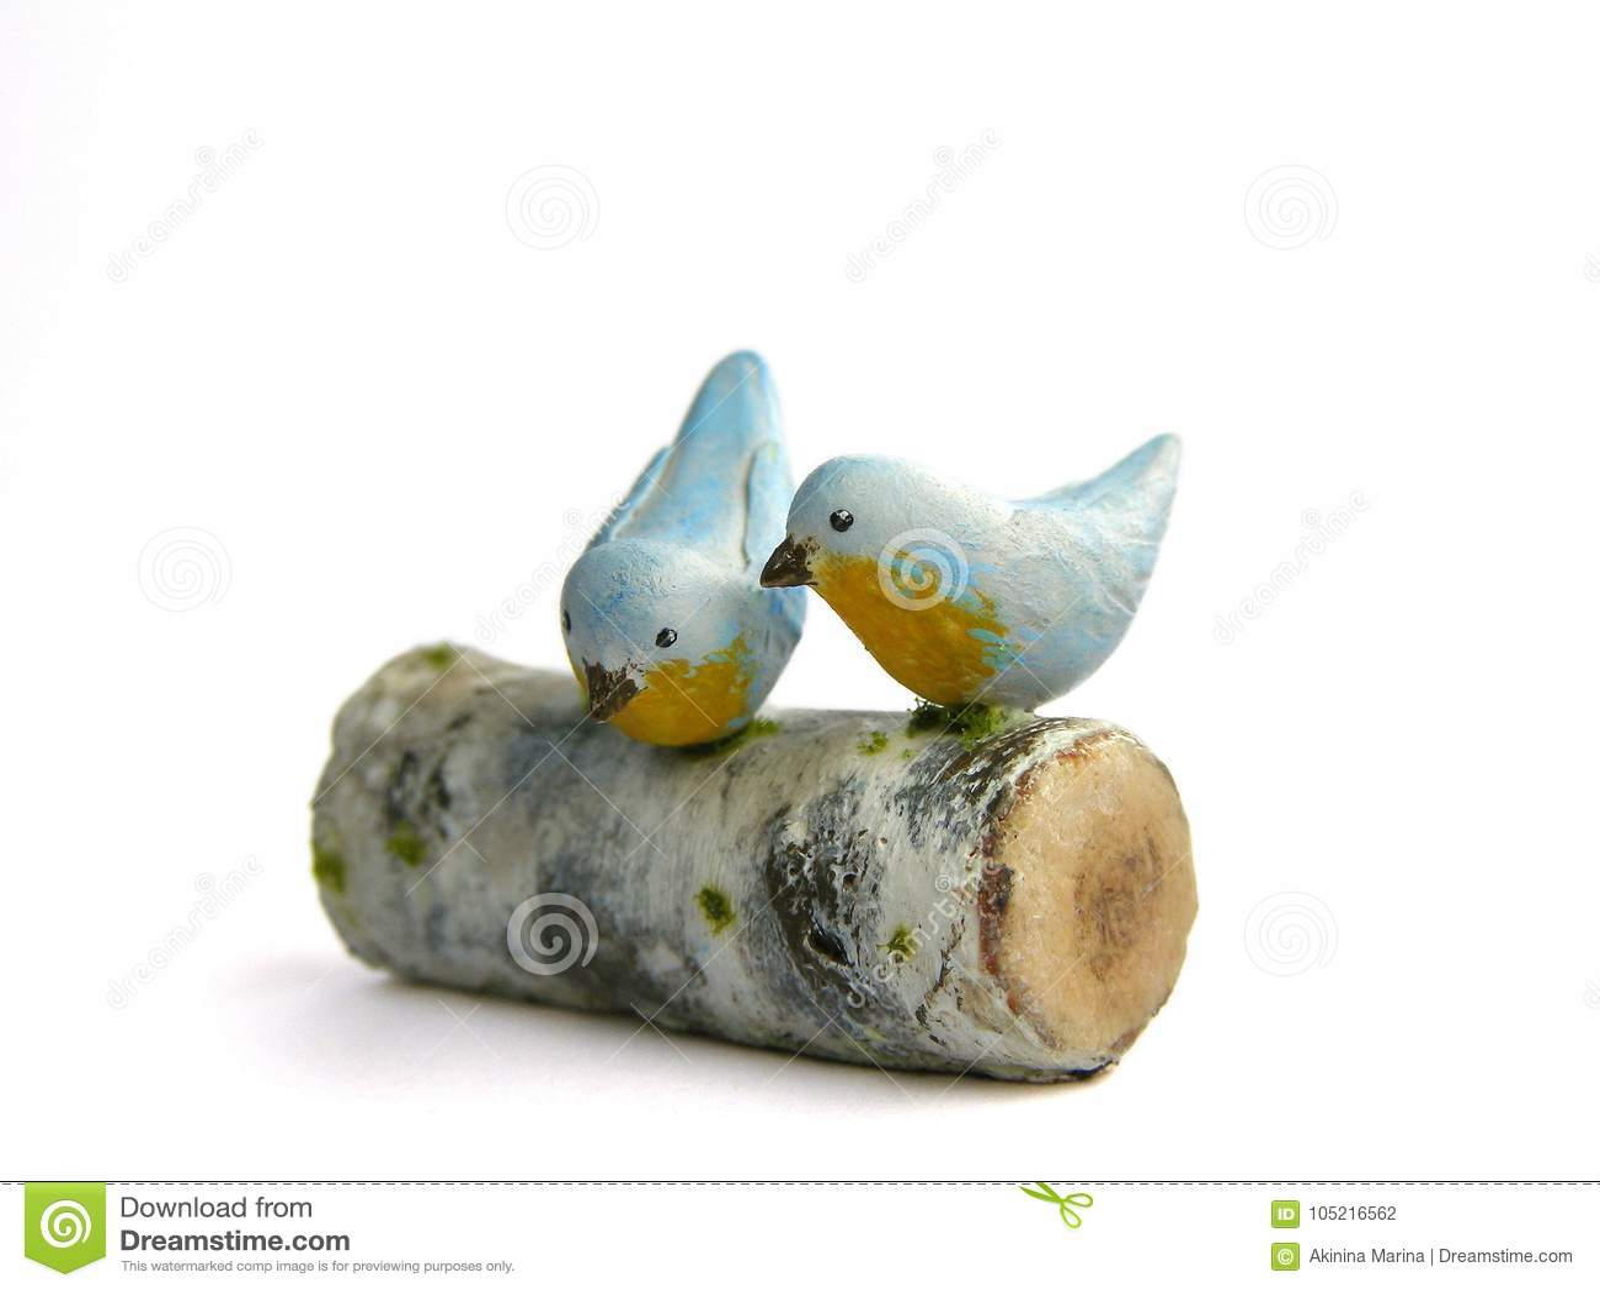 Photo Miniature fake two birds on birch log